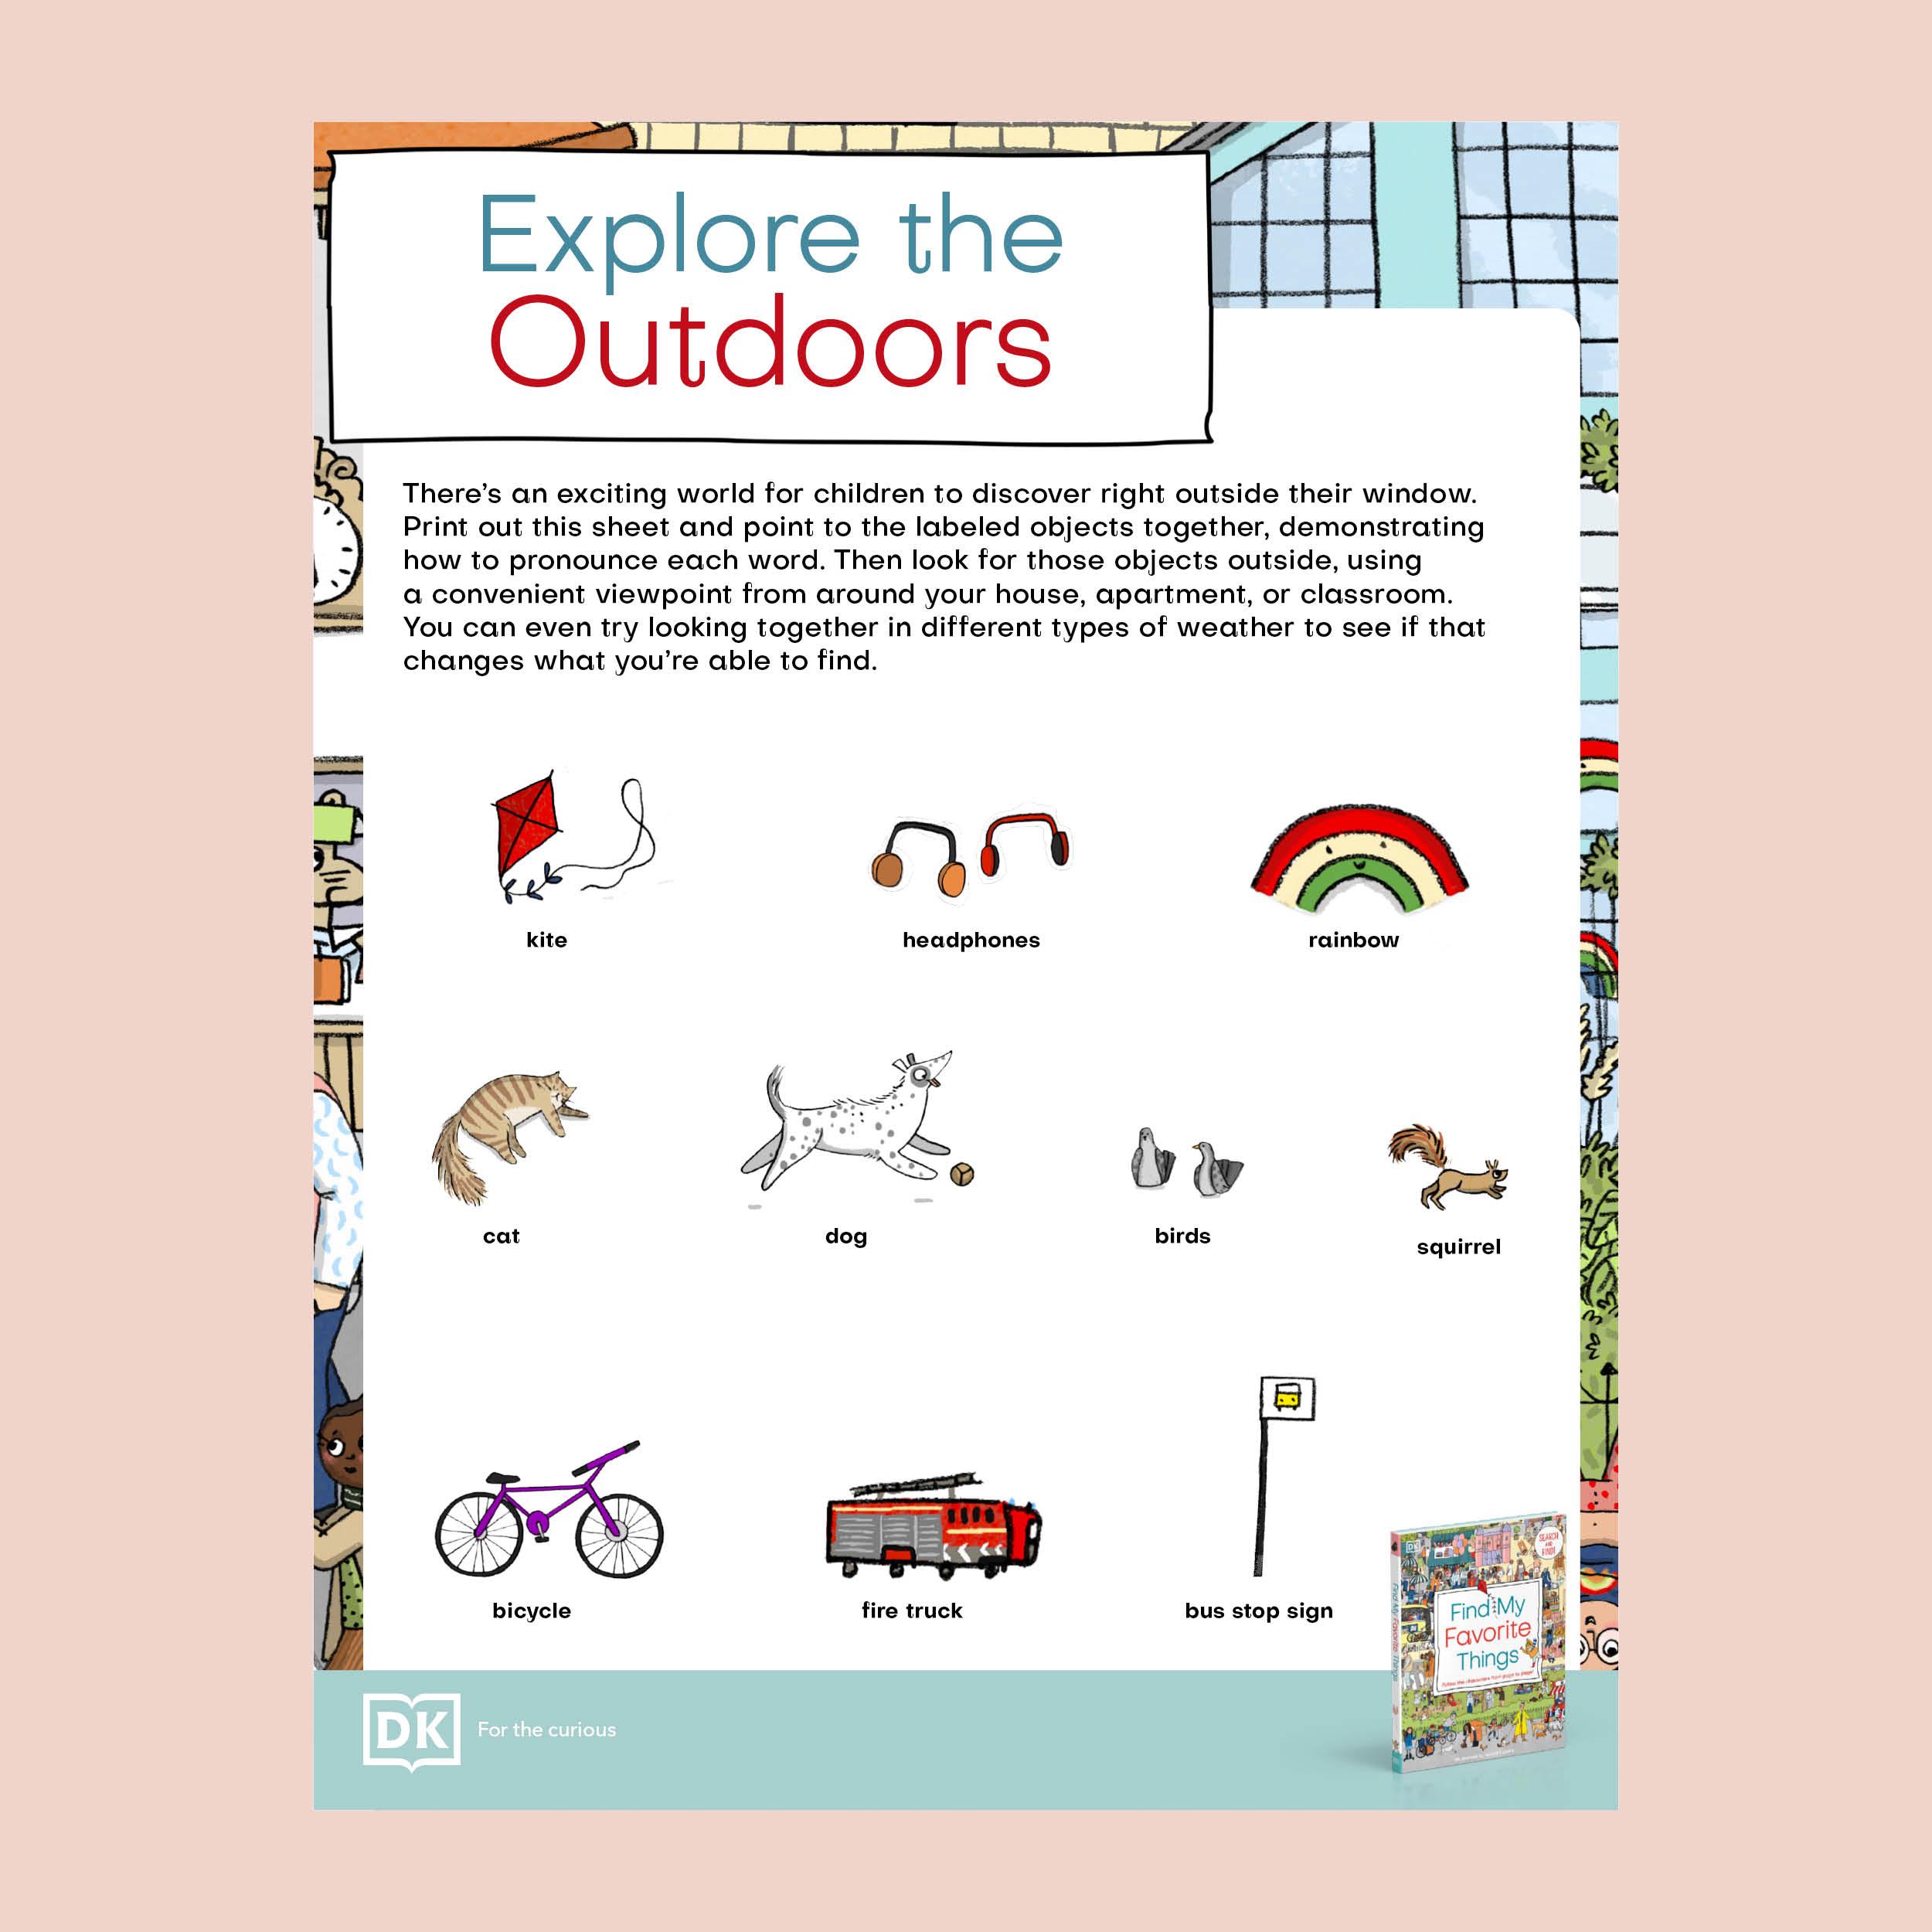 Find My Favorite Things Explore Pack pdf